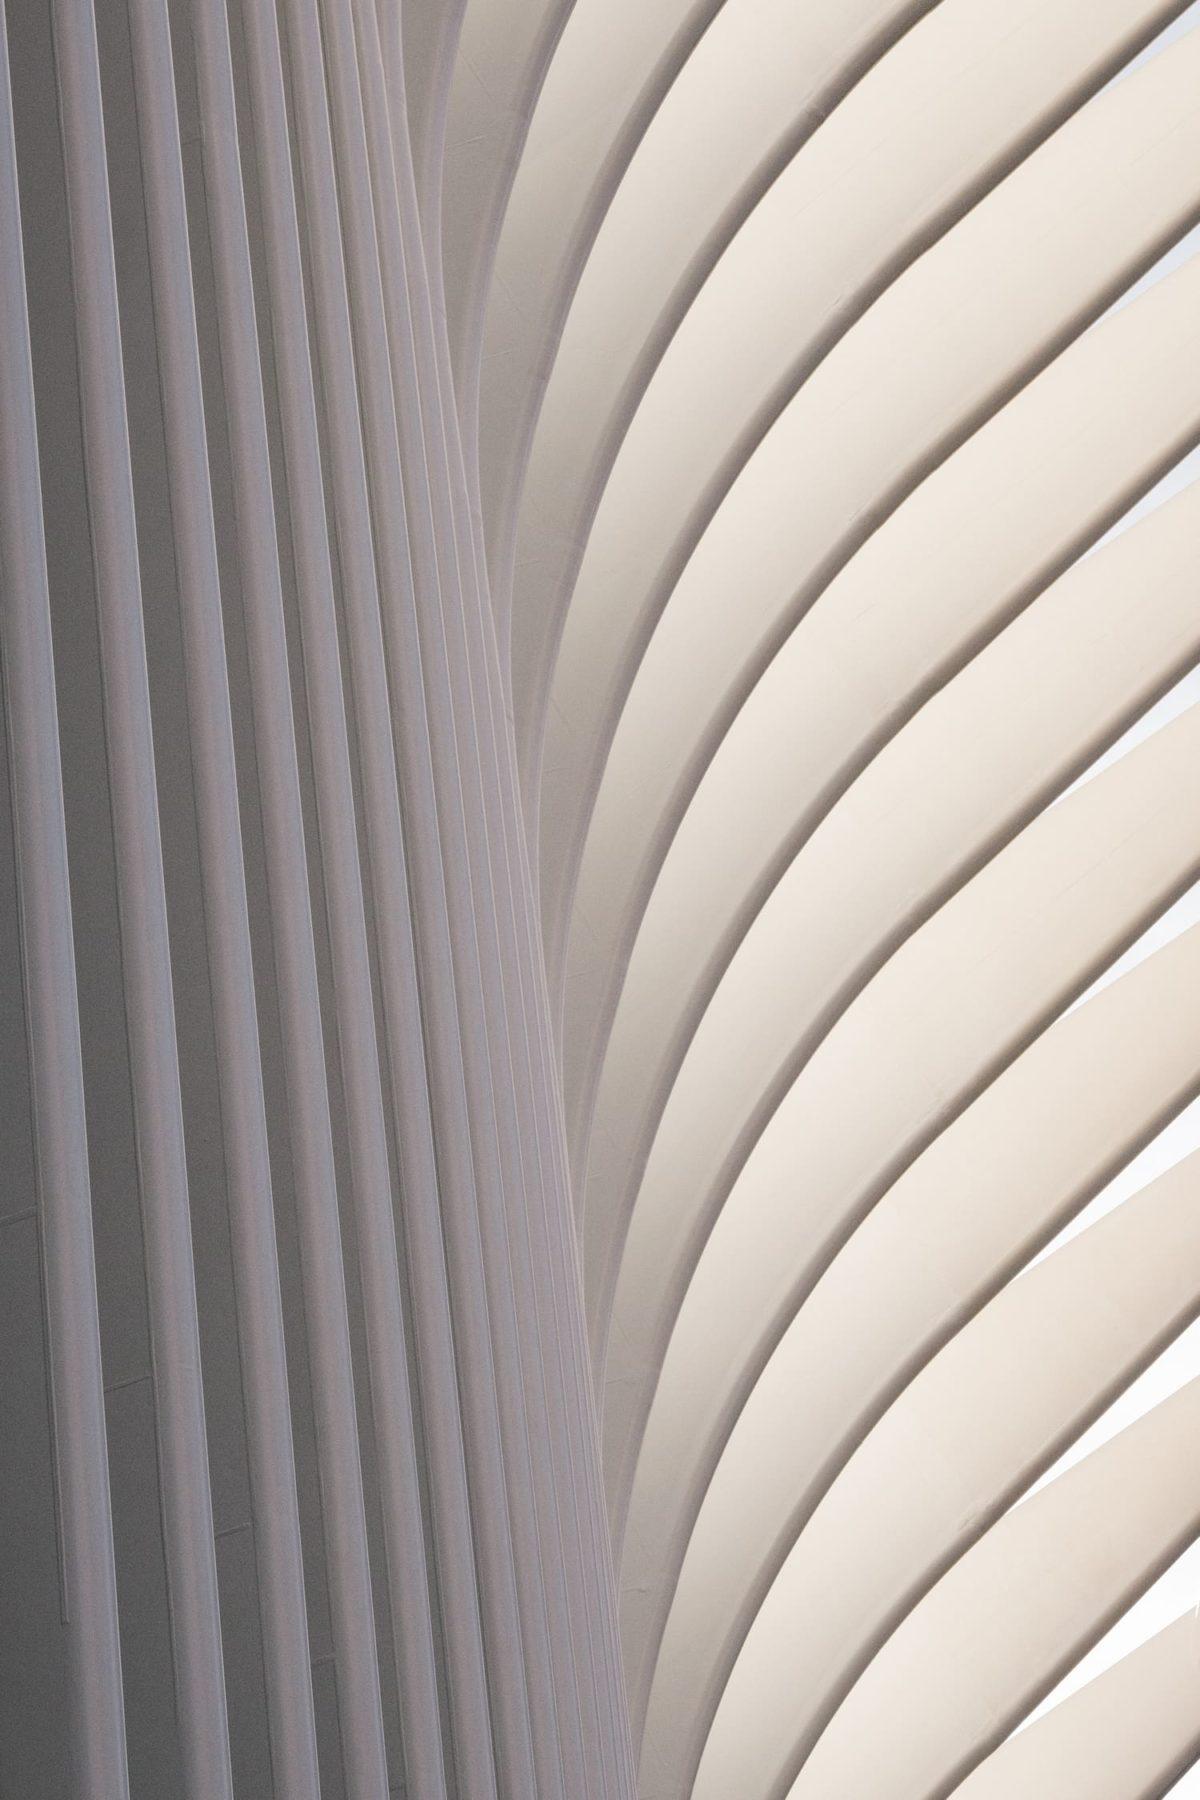 NYC Oculus WTC10